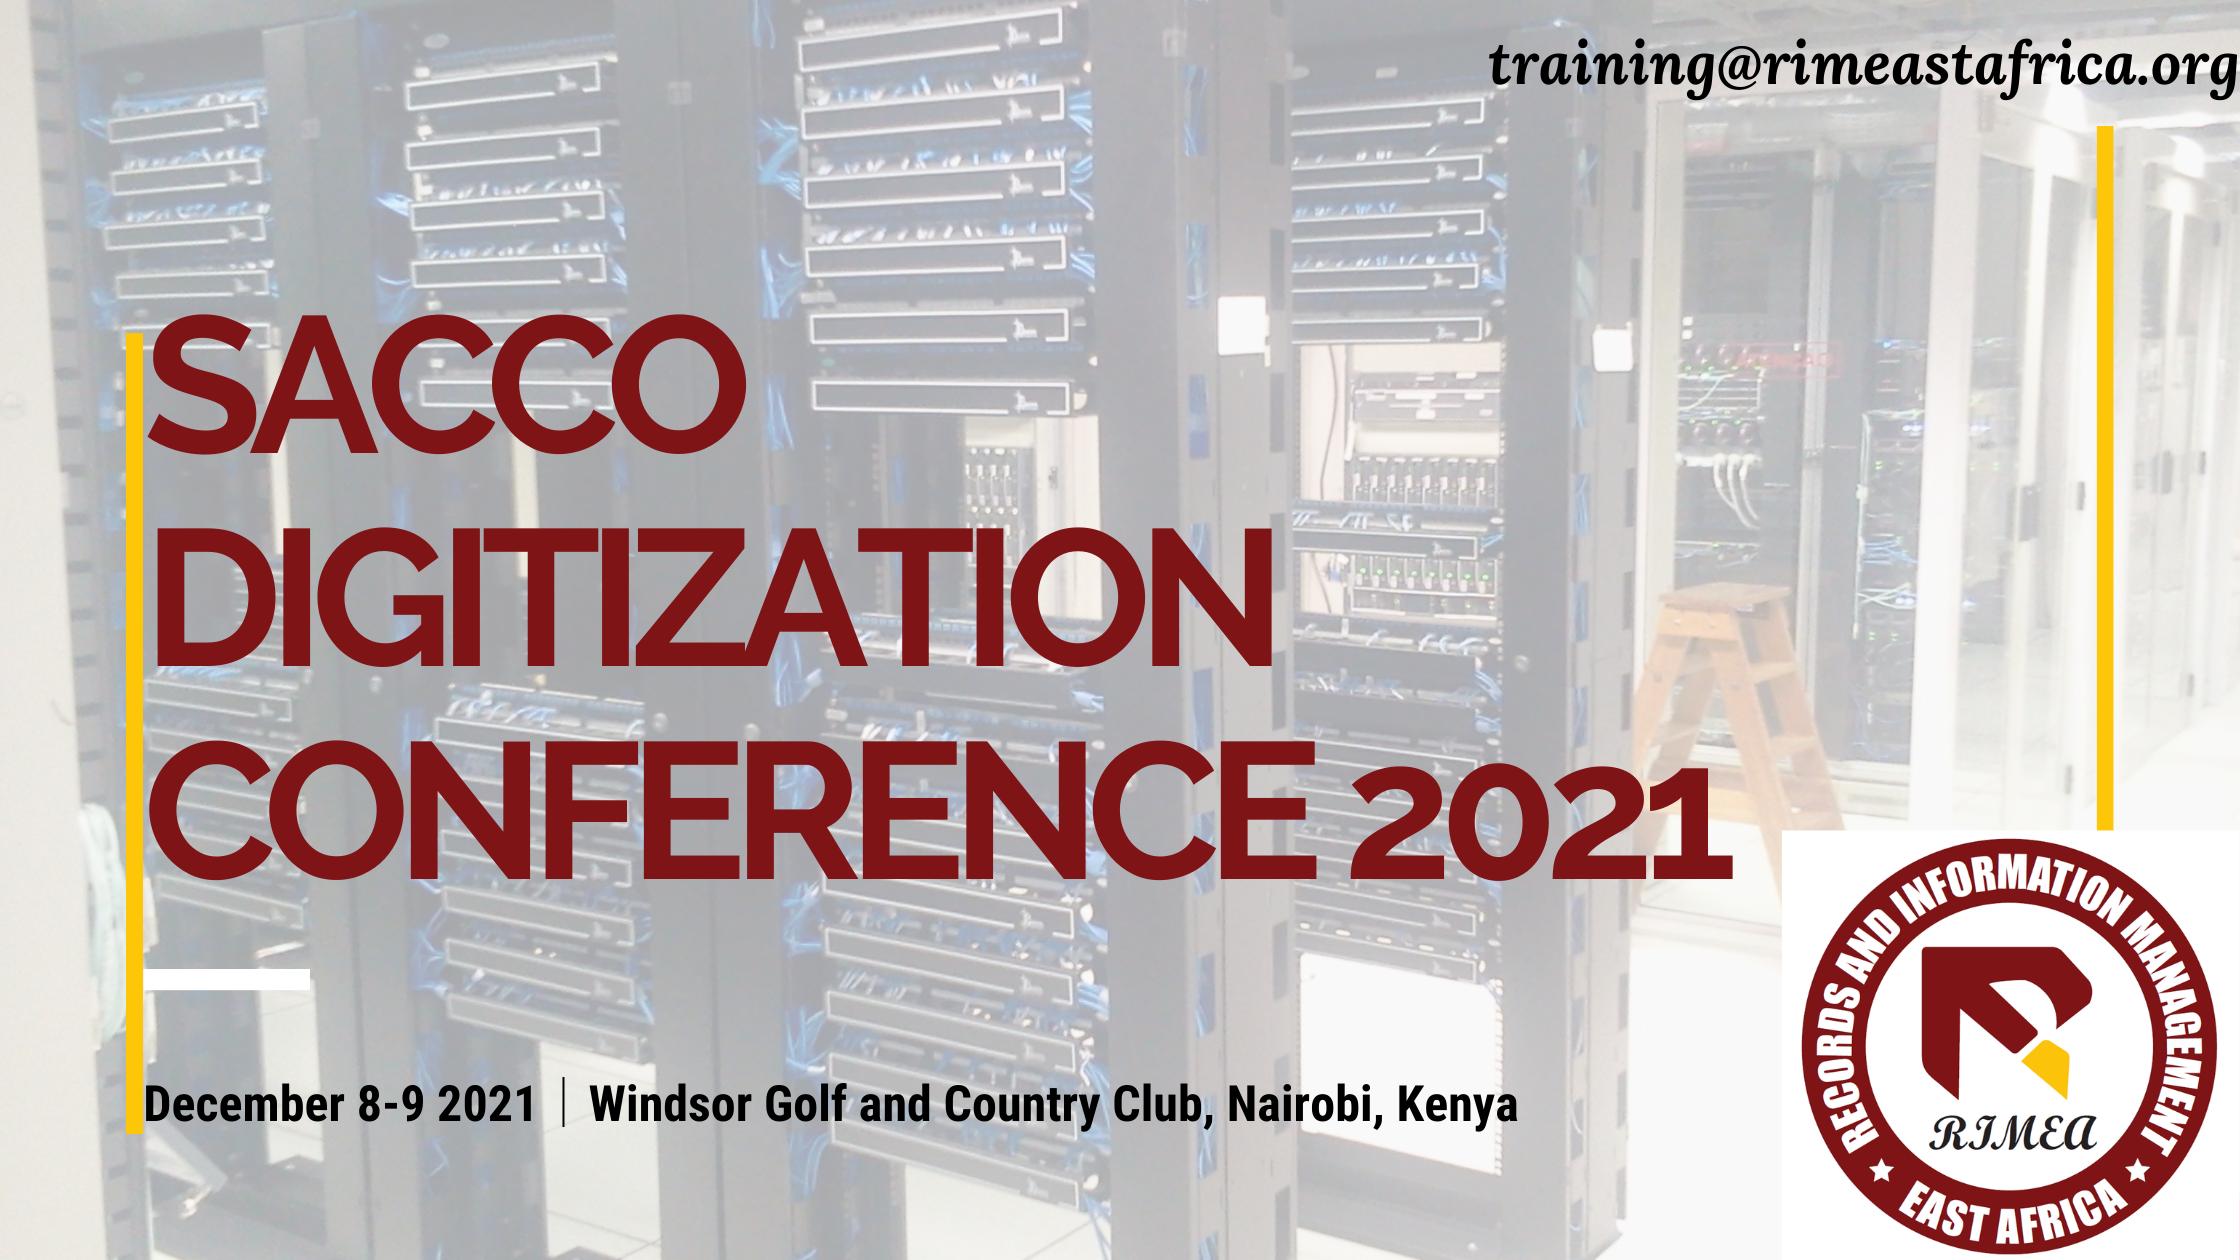 RIMEA Sacco Digitization Conference 2021